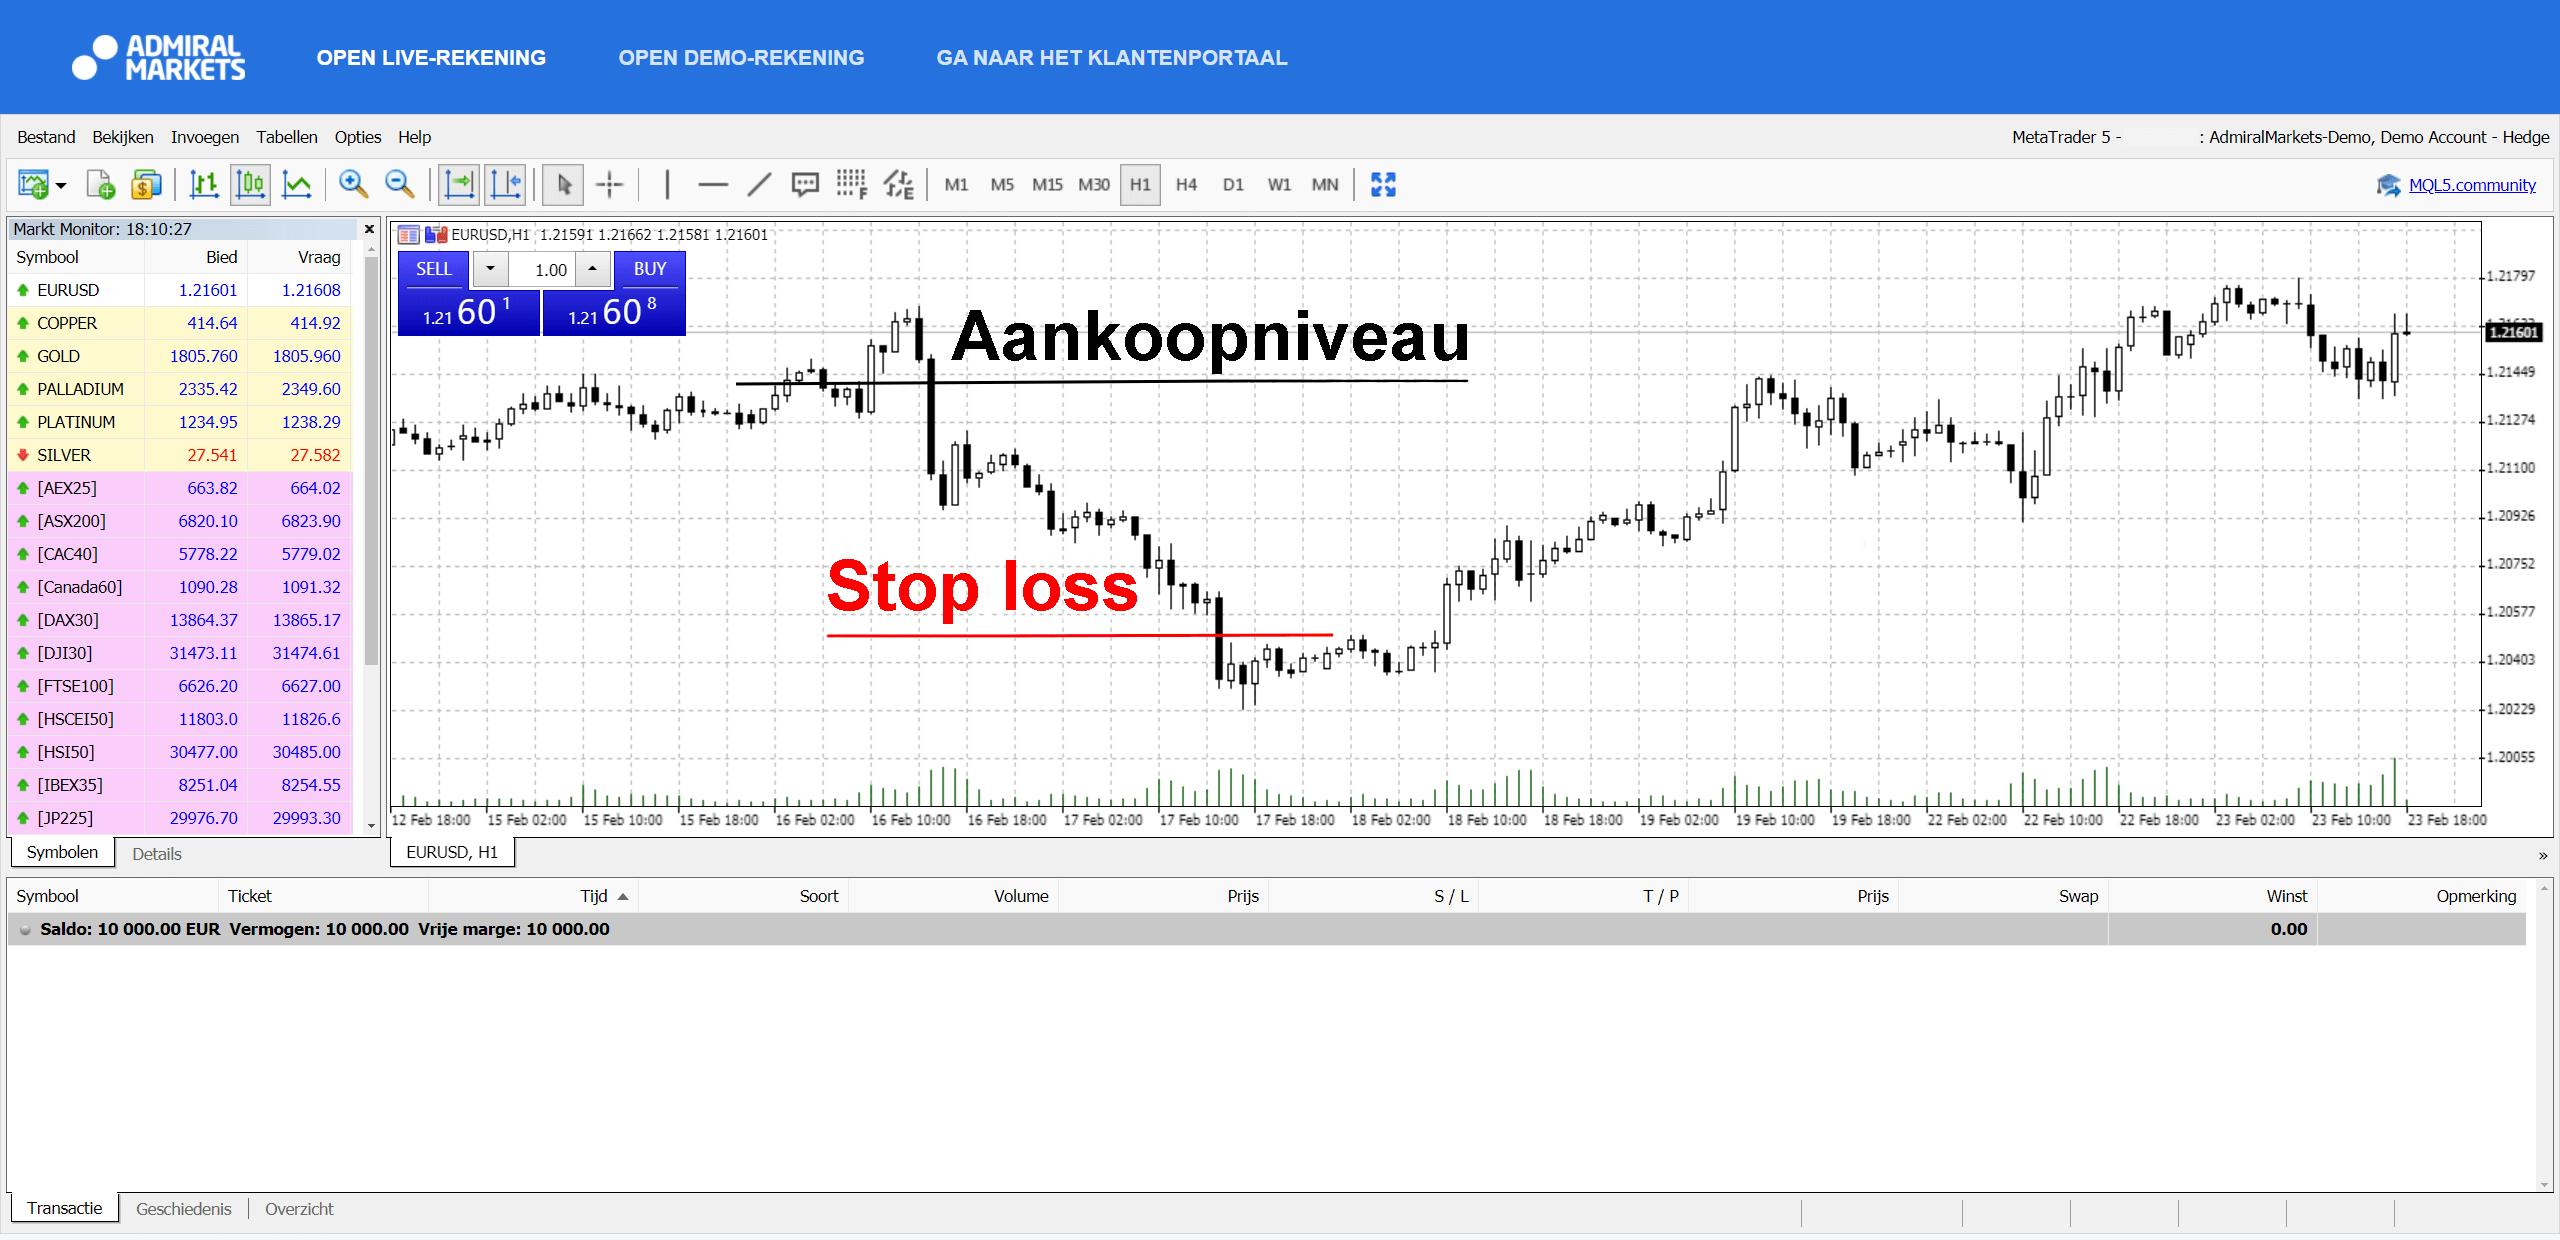 Admiral Markets stop loss